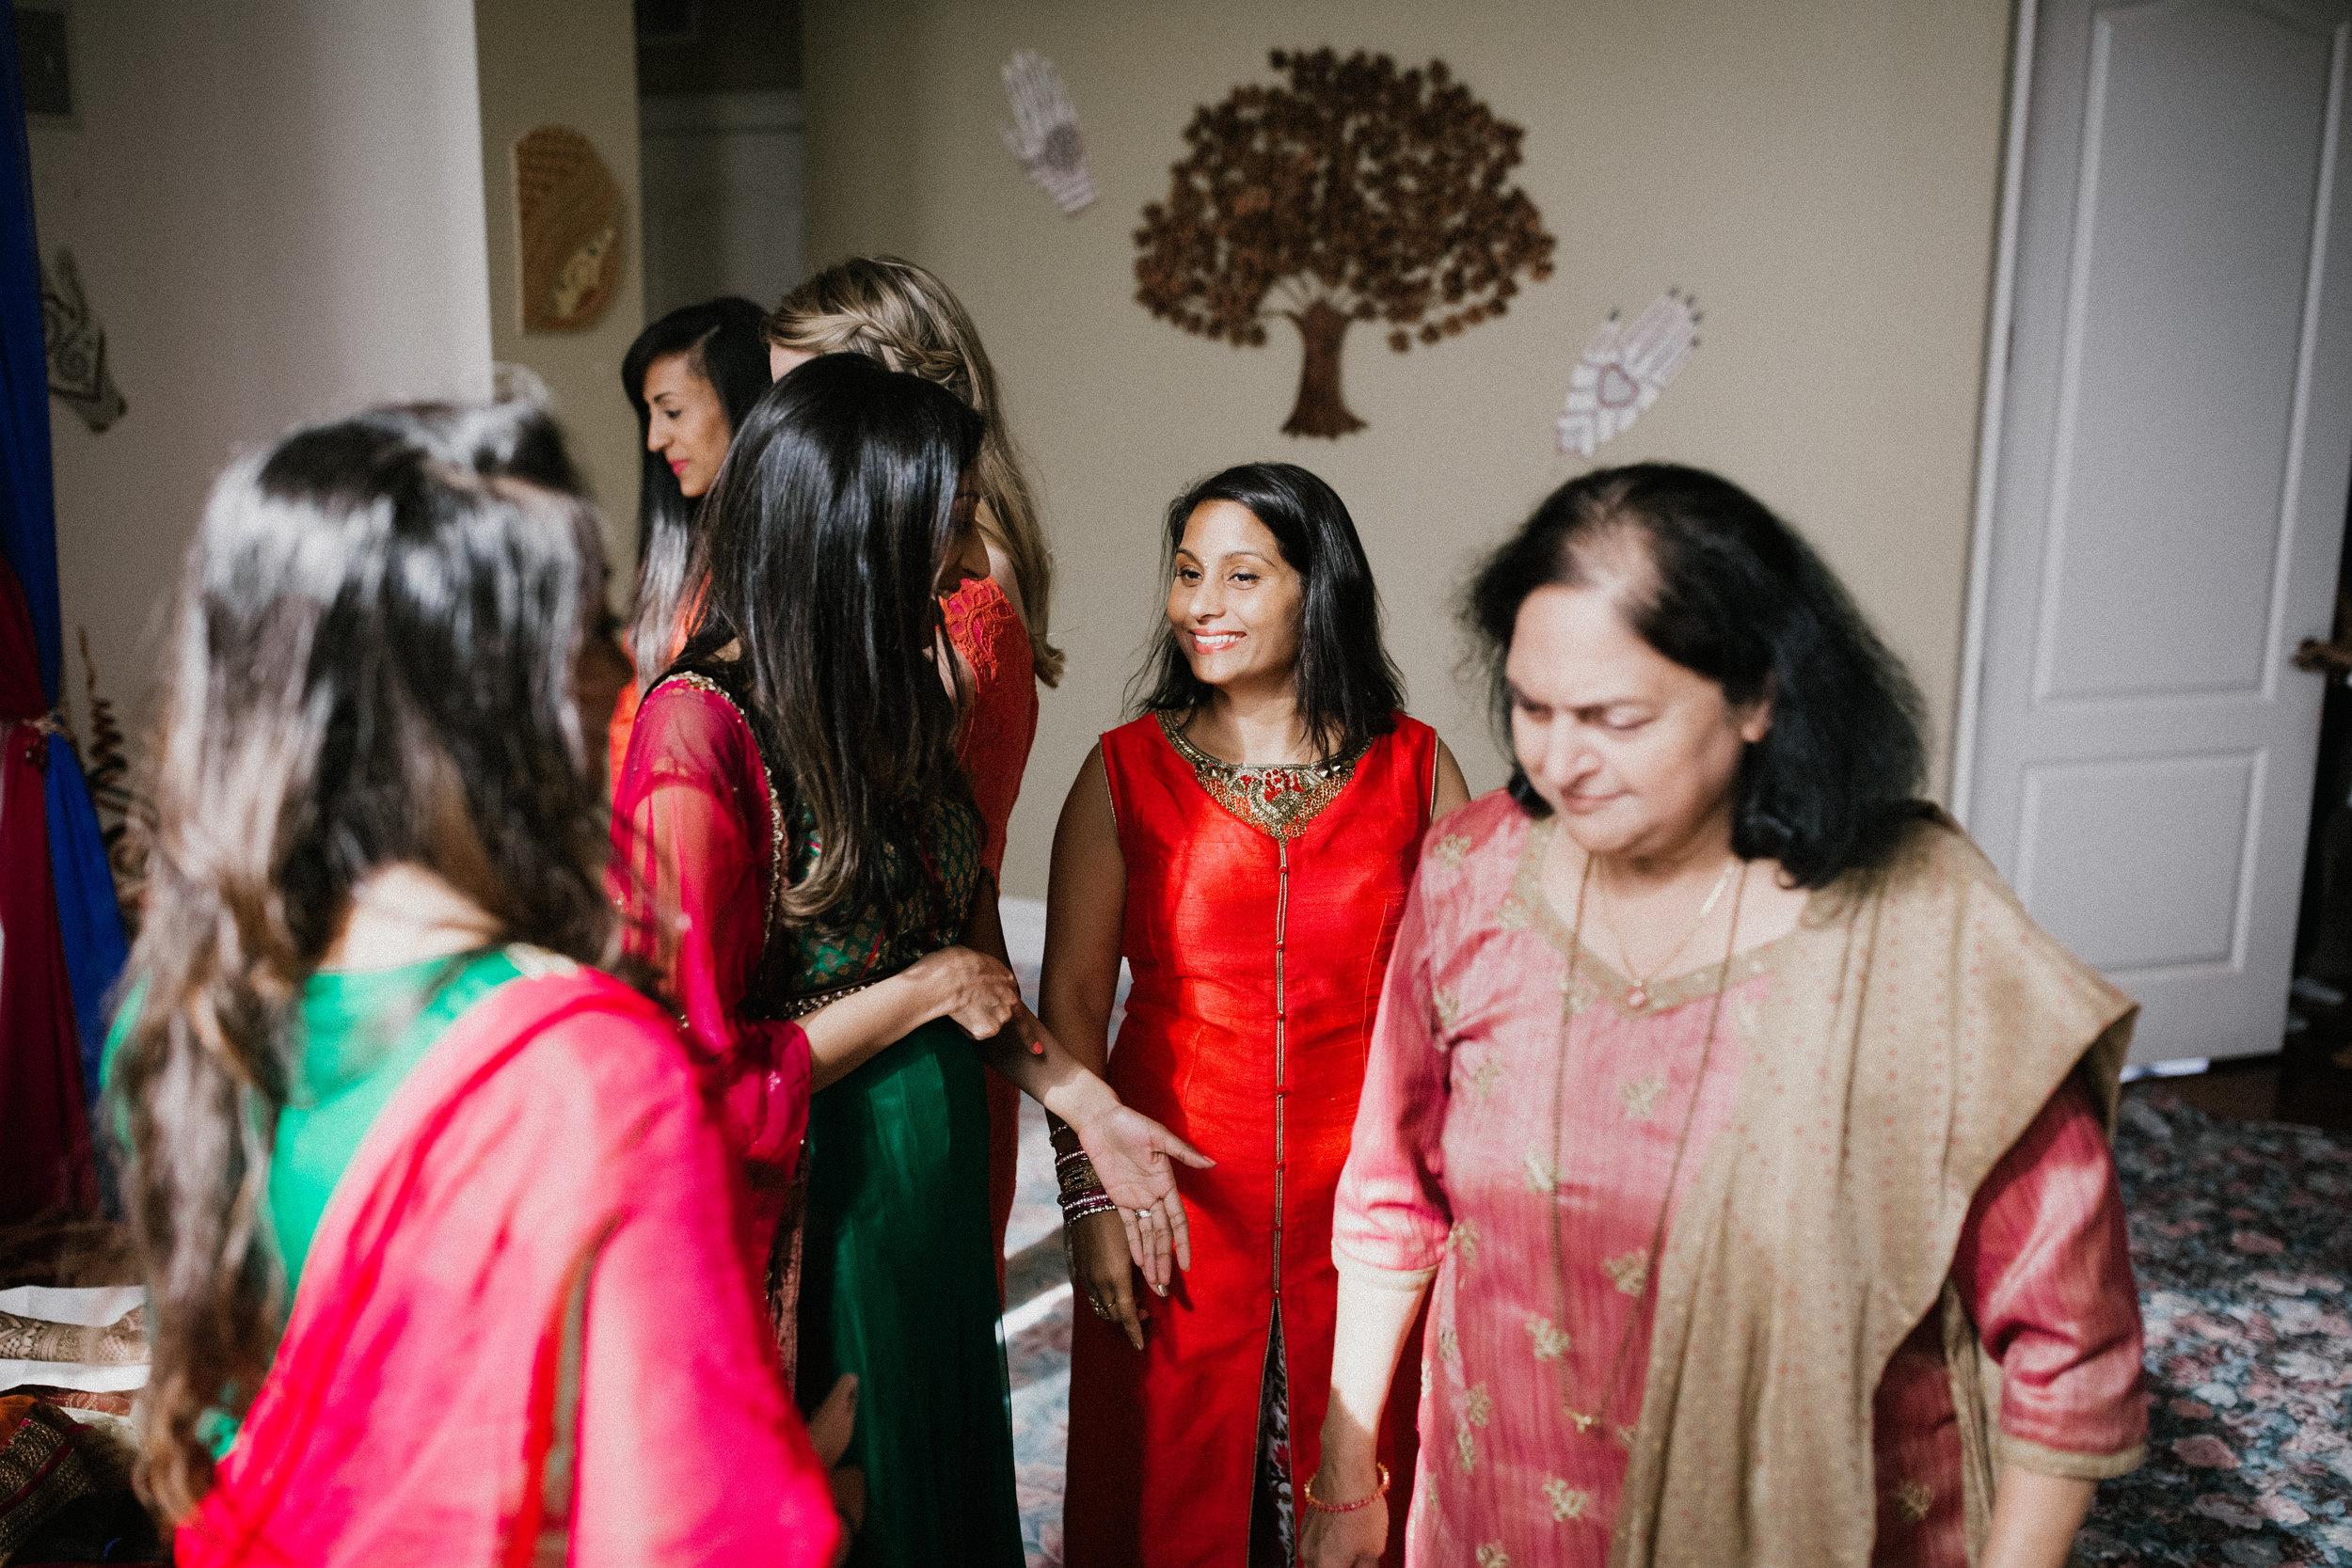 Aparna-Ankit-Patel-Mehndi-Wedding-Photos-0010.jpg